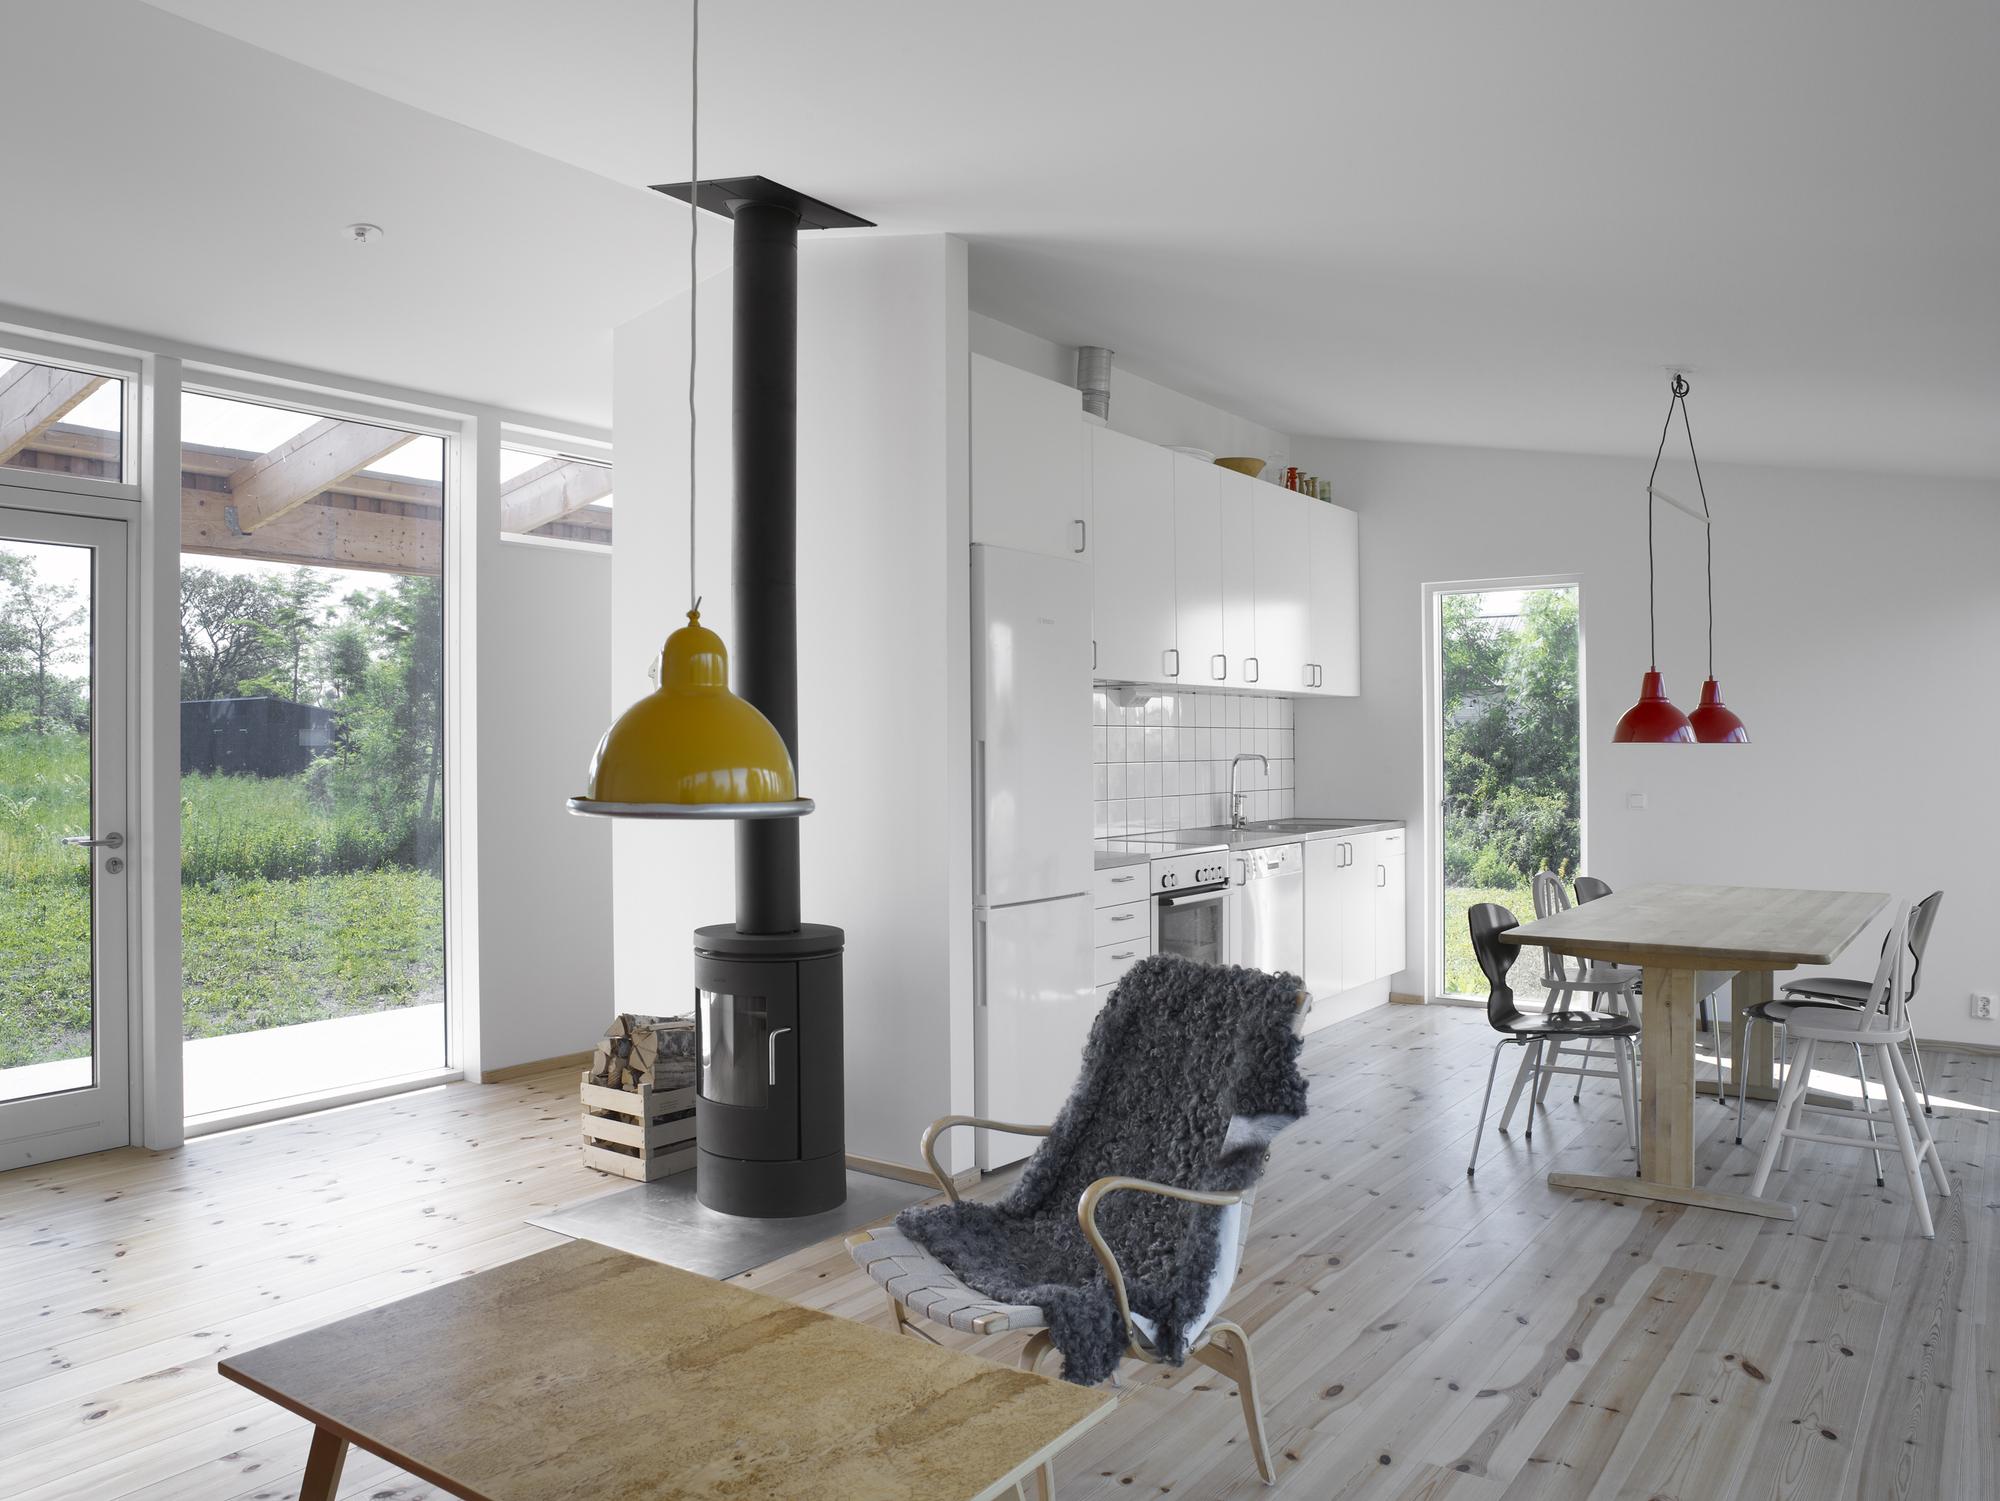 Best Kitchen Gallery: Swedish Home Design Plans Home Design And Style of Swedish Home Design  on rachelxblog.com